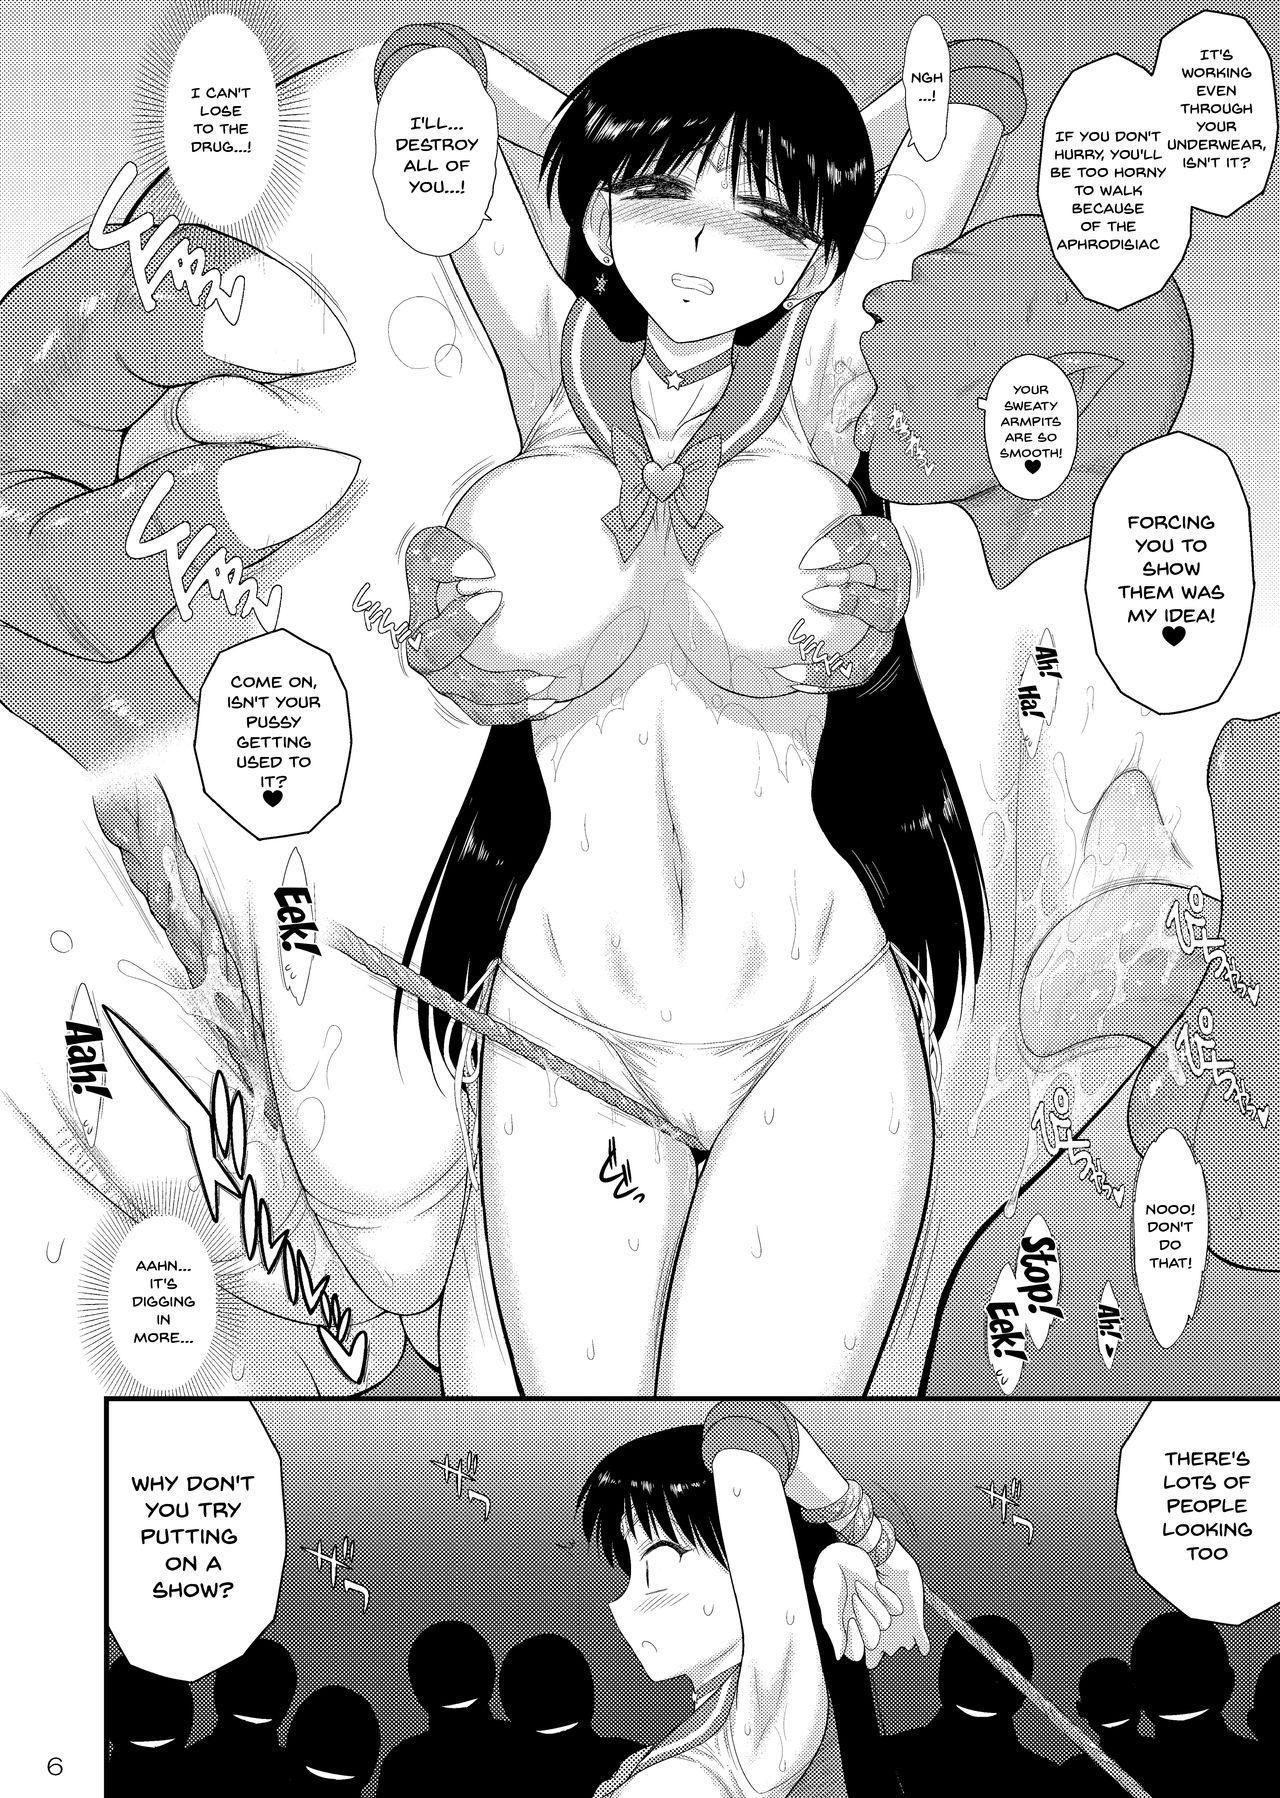 Bisoku Zenshin | Flirtation Sped Forward 4